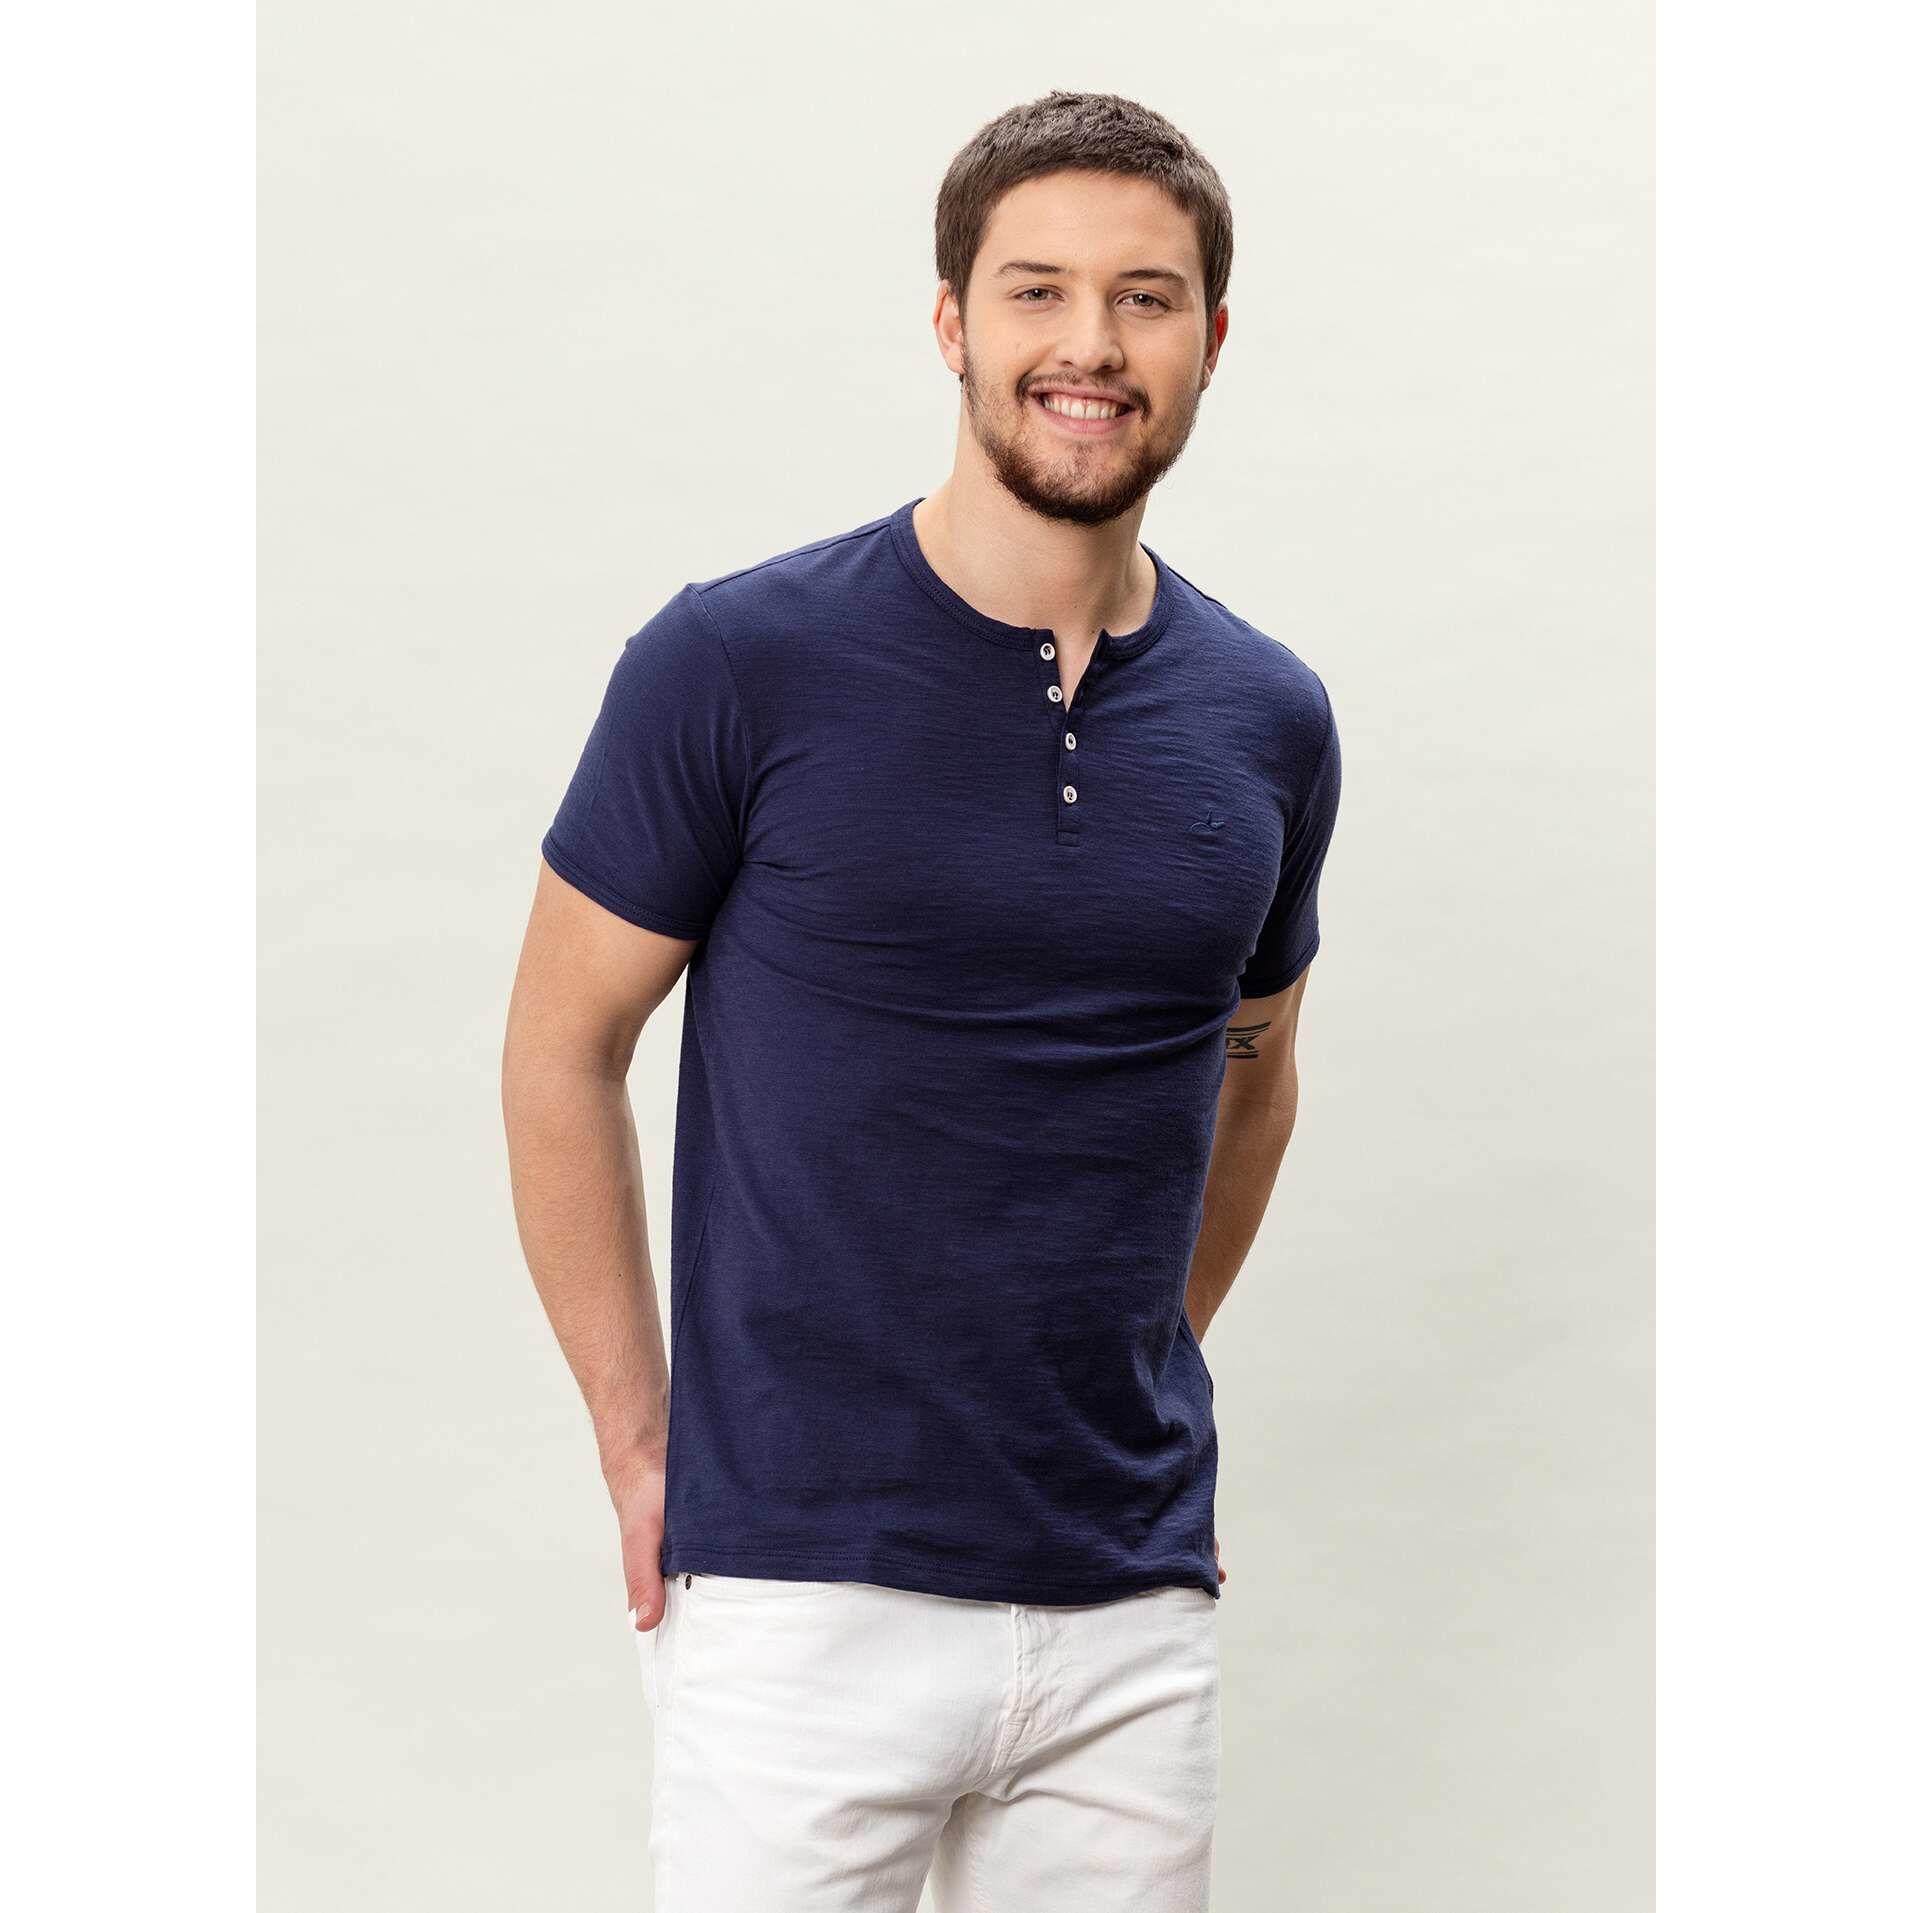 Herrenmode  Shirts  Herren Henley T shirt   navy